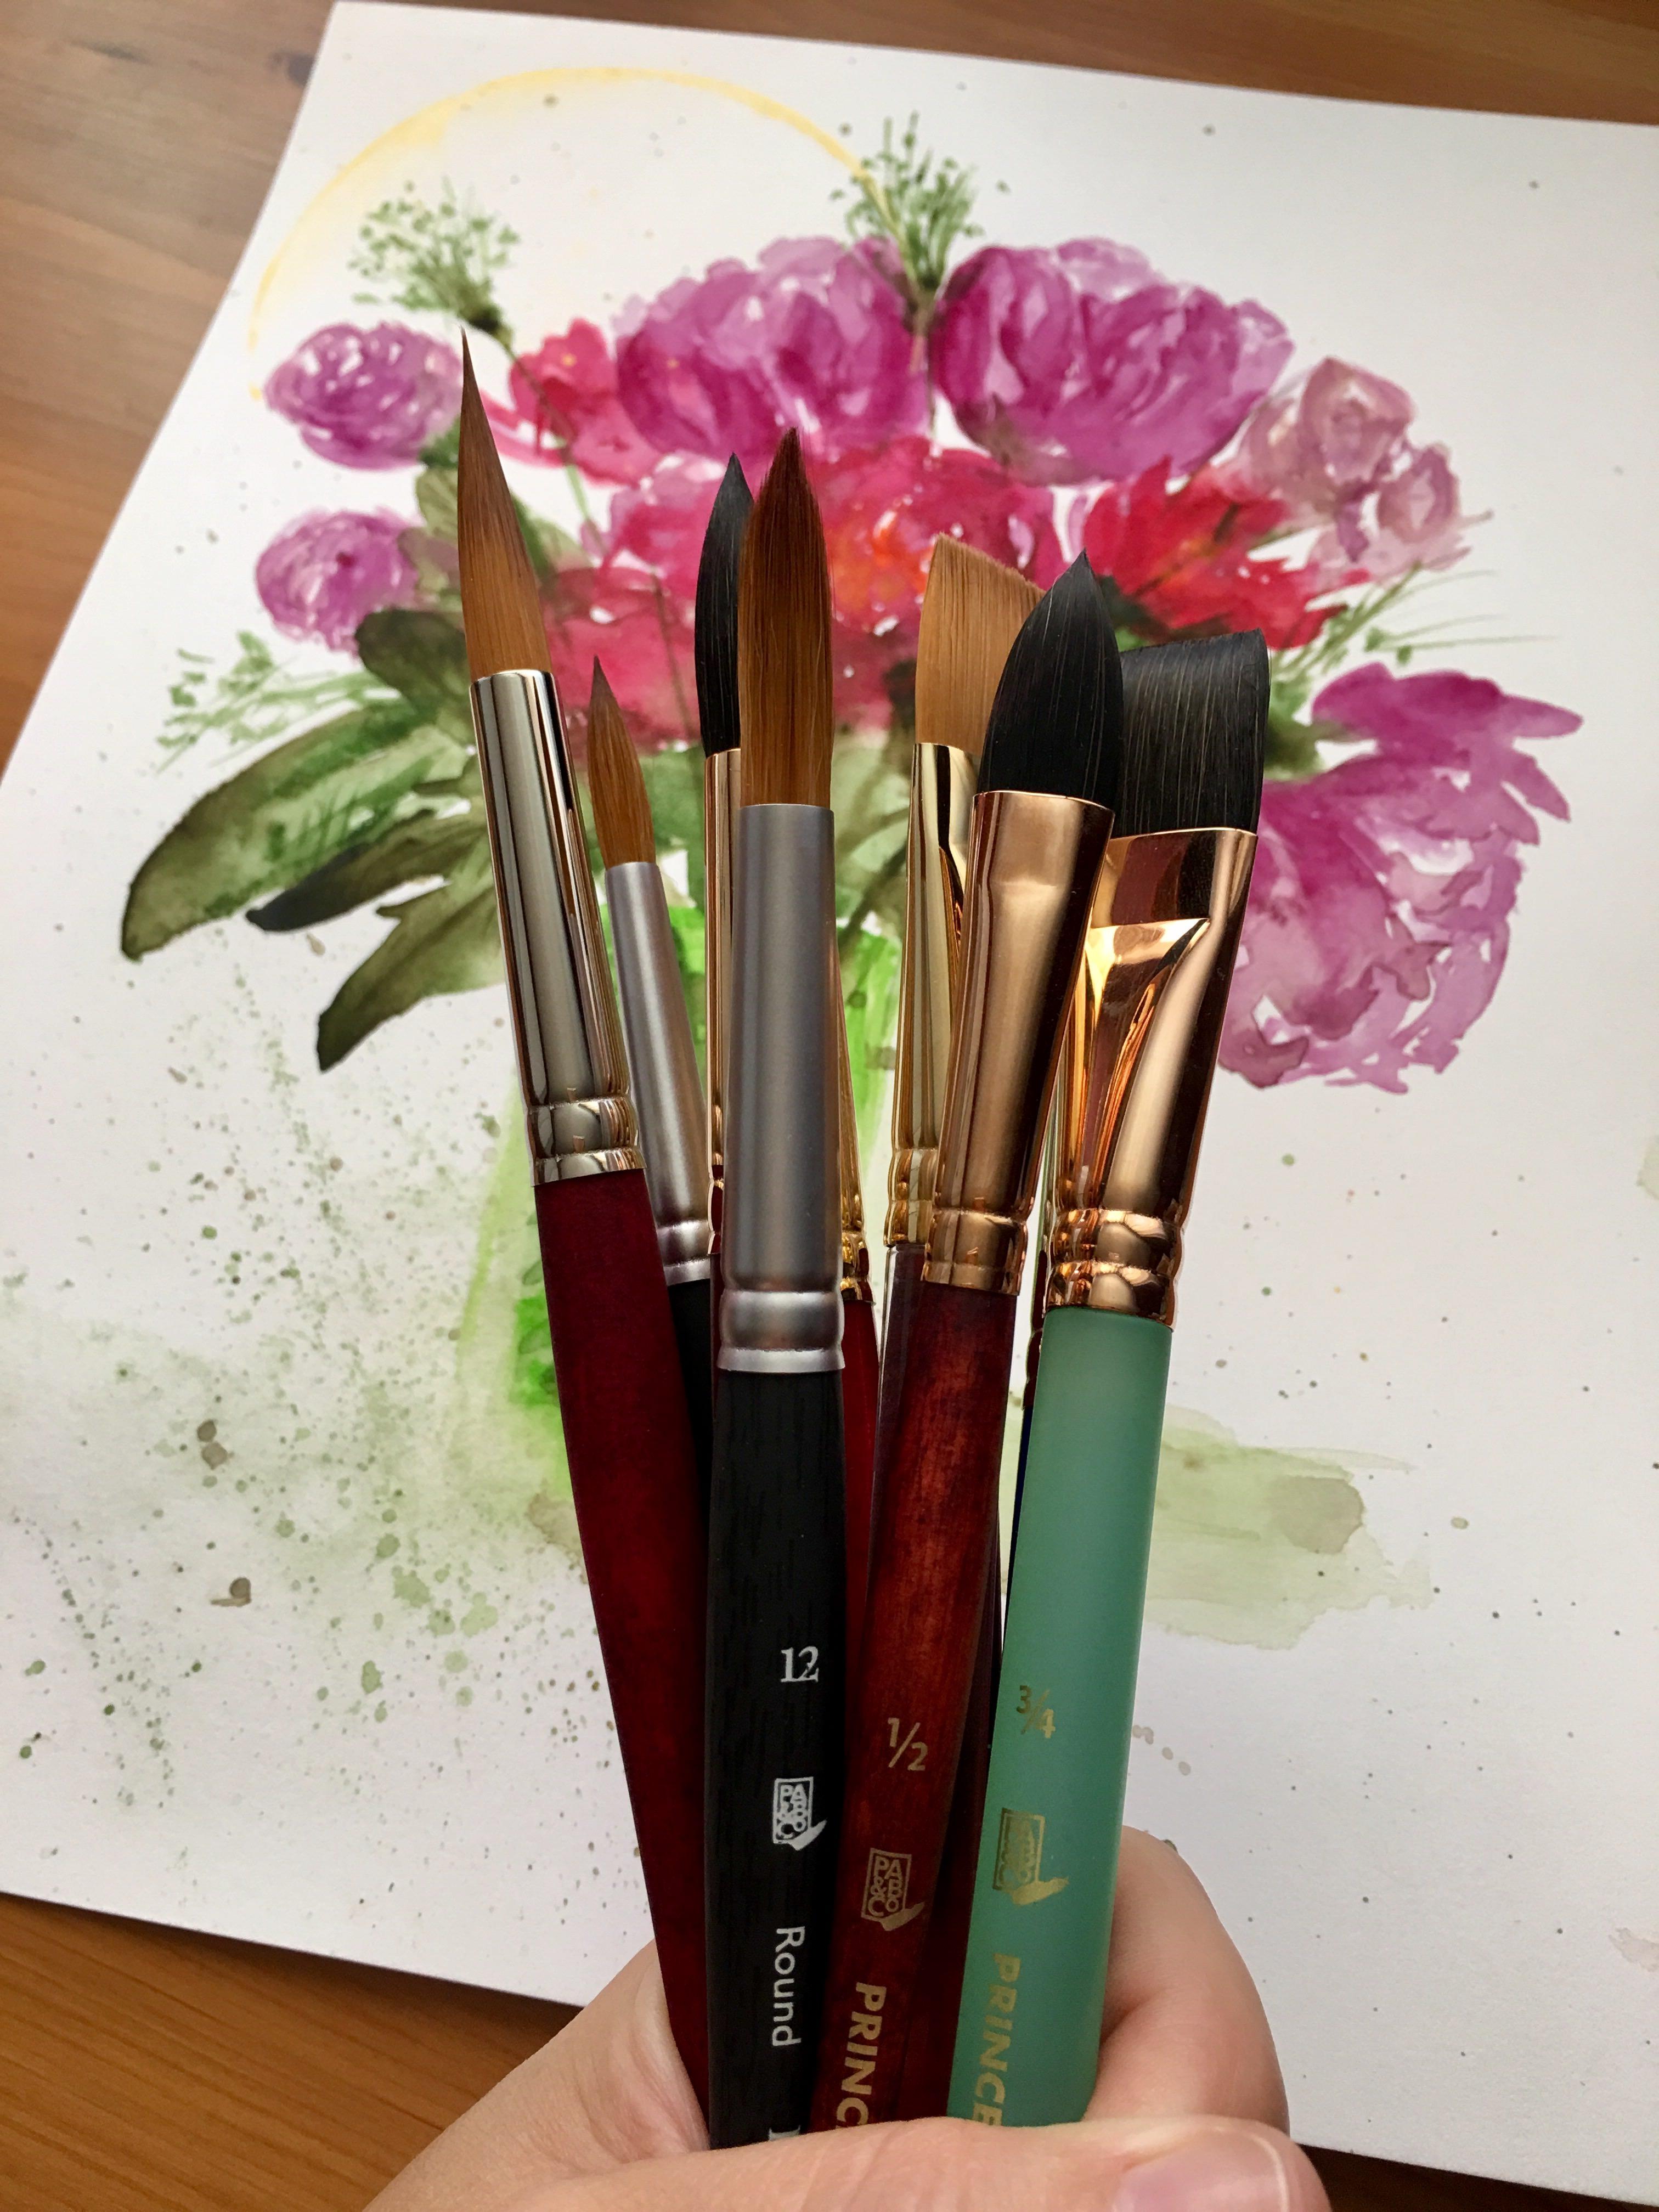 7050 Kolinsky Sable Short Handle Watercolor Paint Brush Size 4 Round 7050R-4--Best Watercolor Brush Princeton 1-Pack